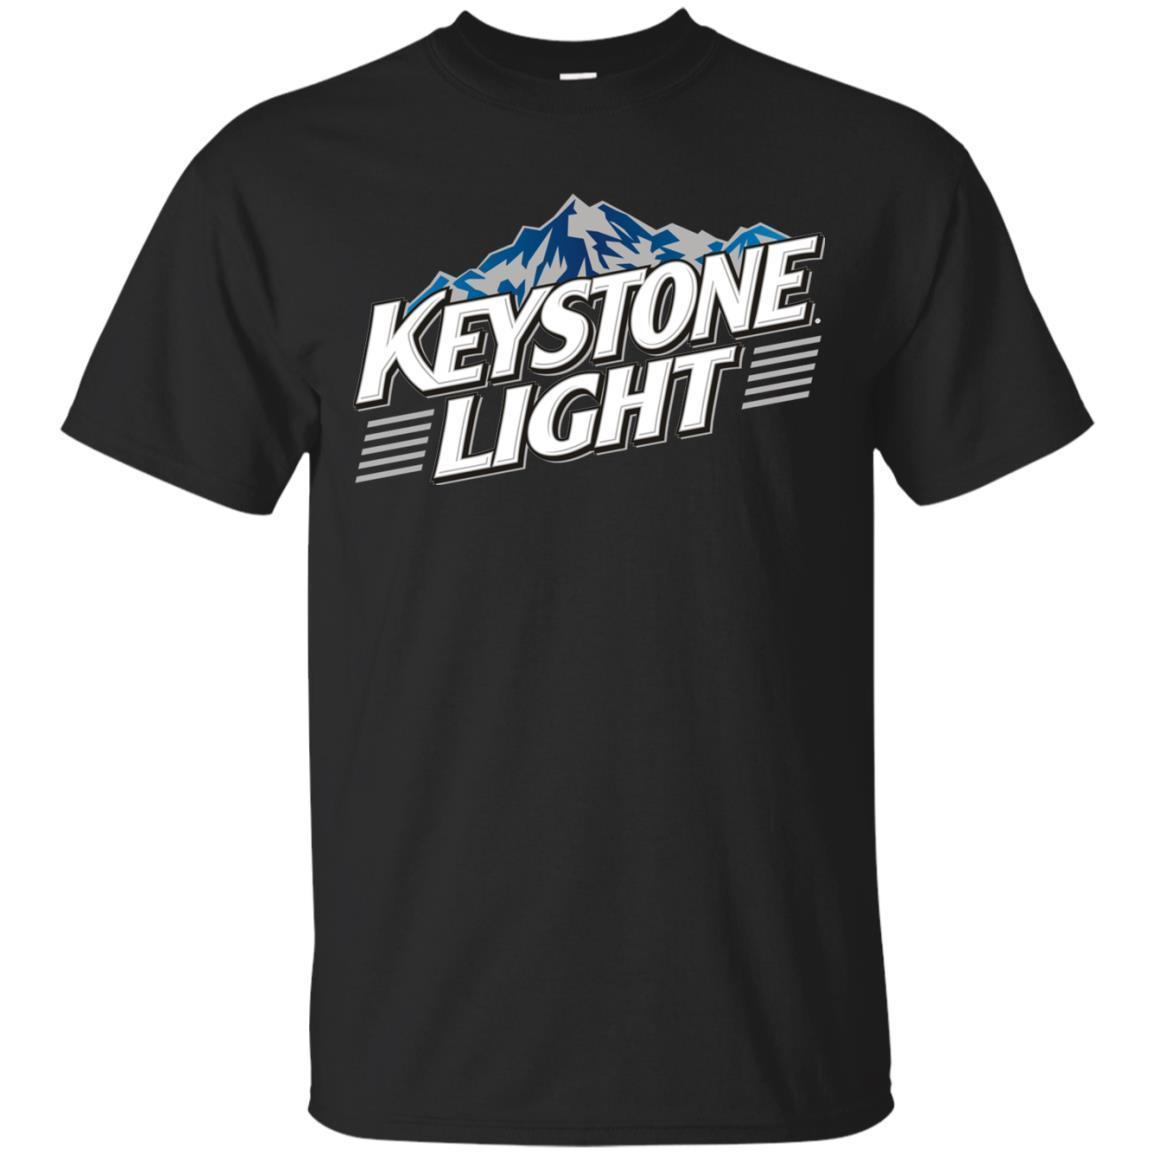 Keystone Light Beer – T-Shirt, Pullover Hoodie